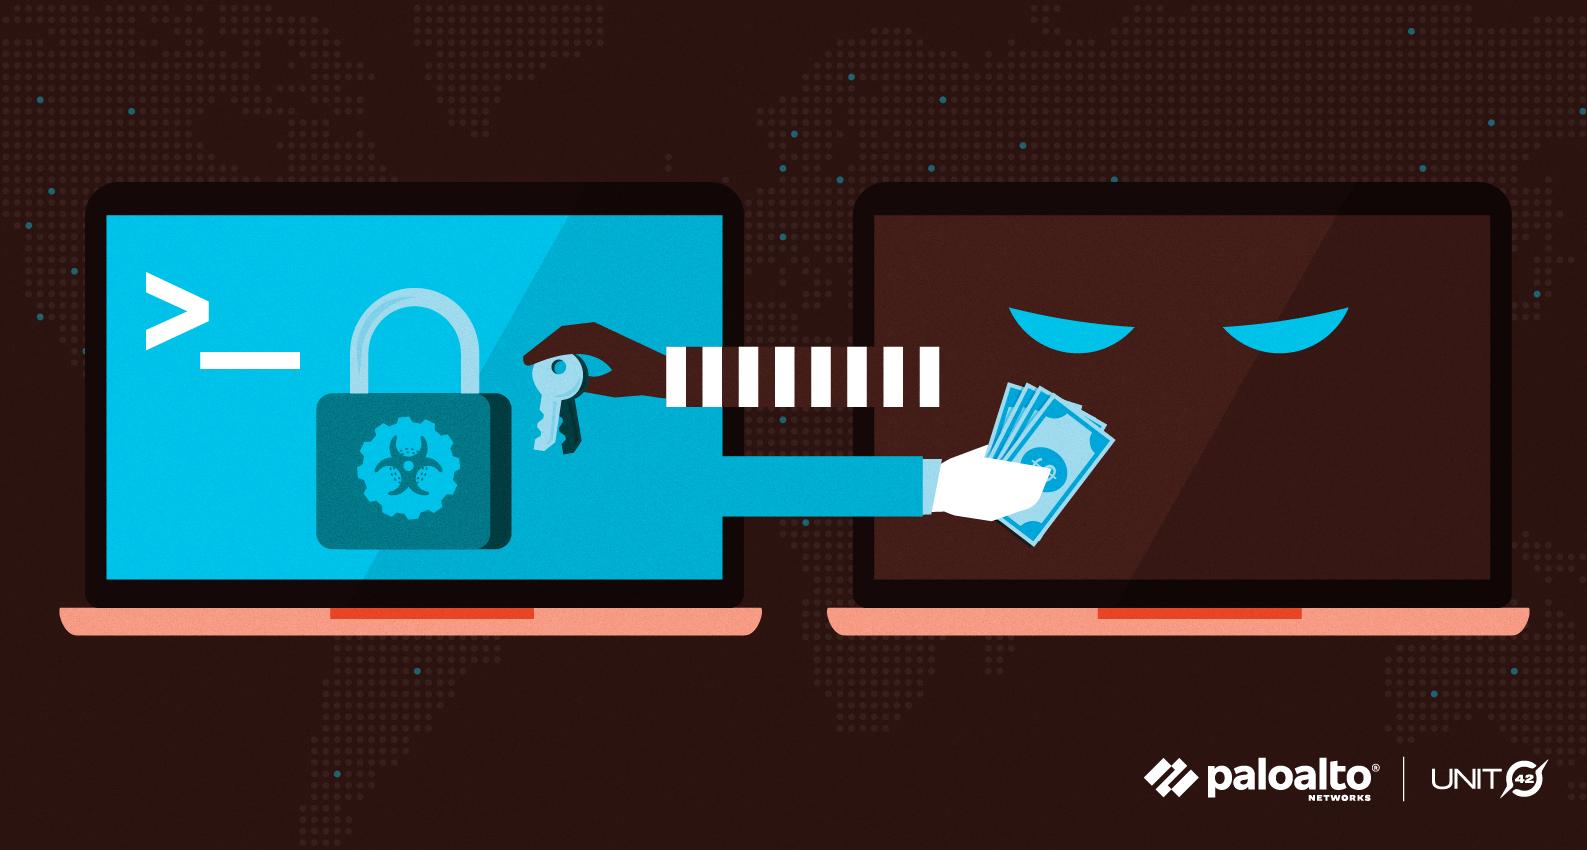 A conceptual image representing ransomware attacks